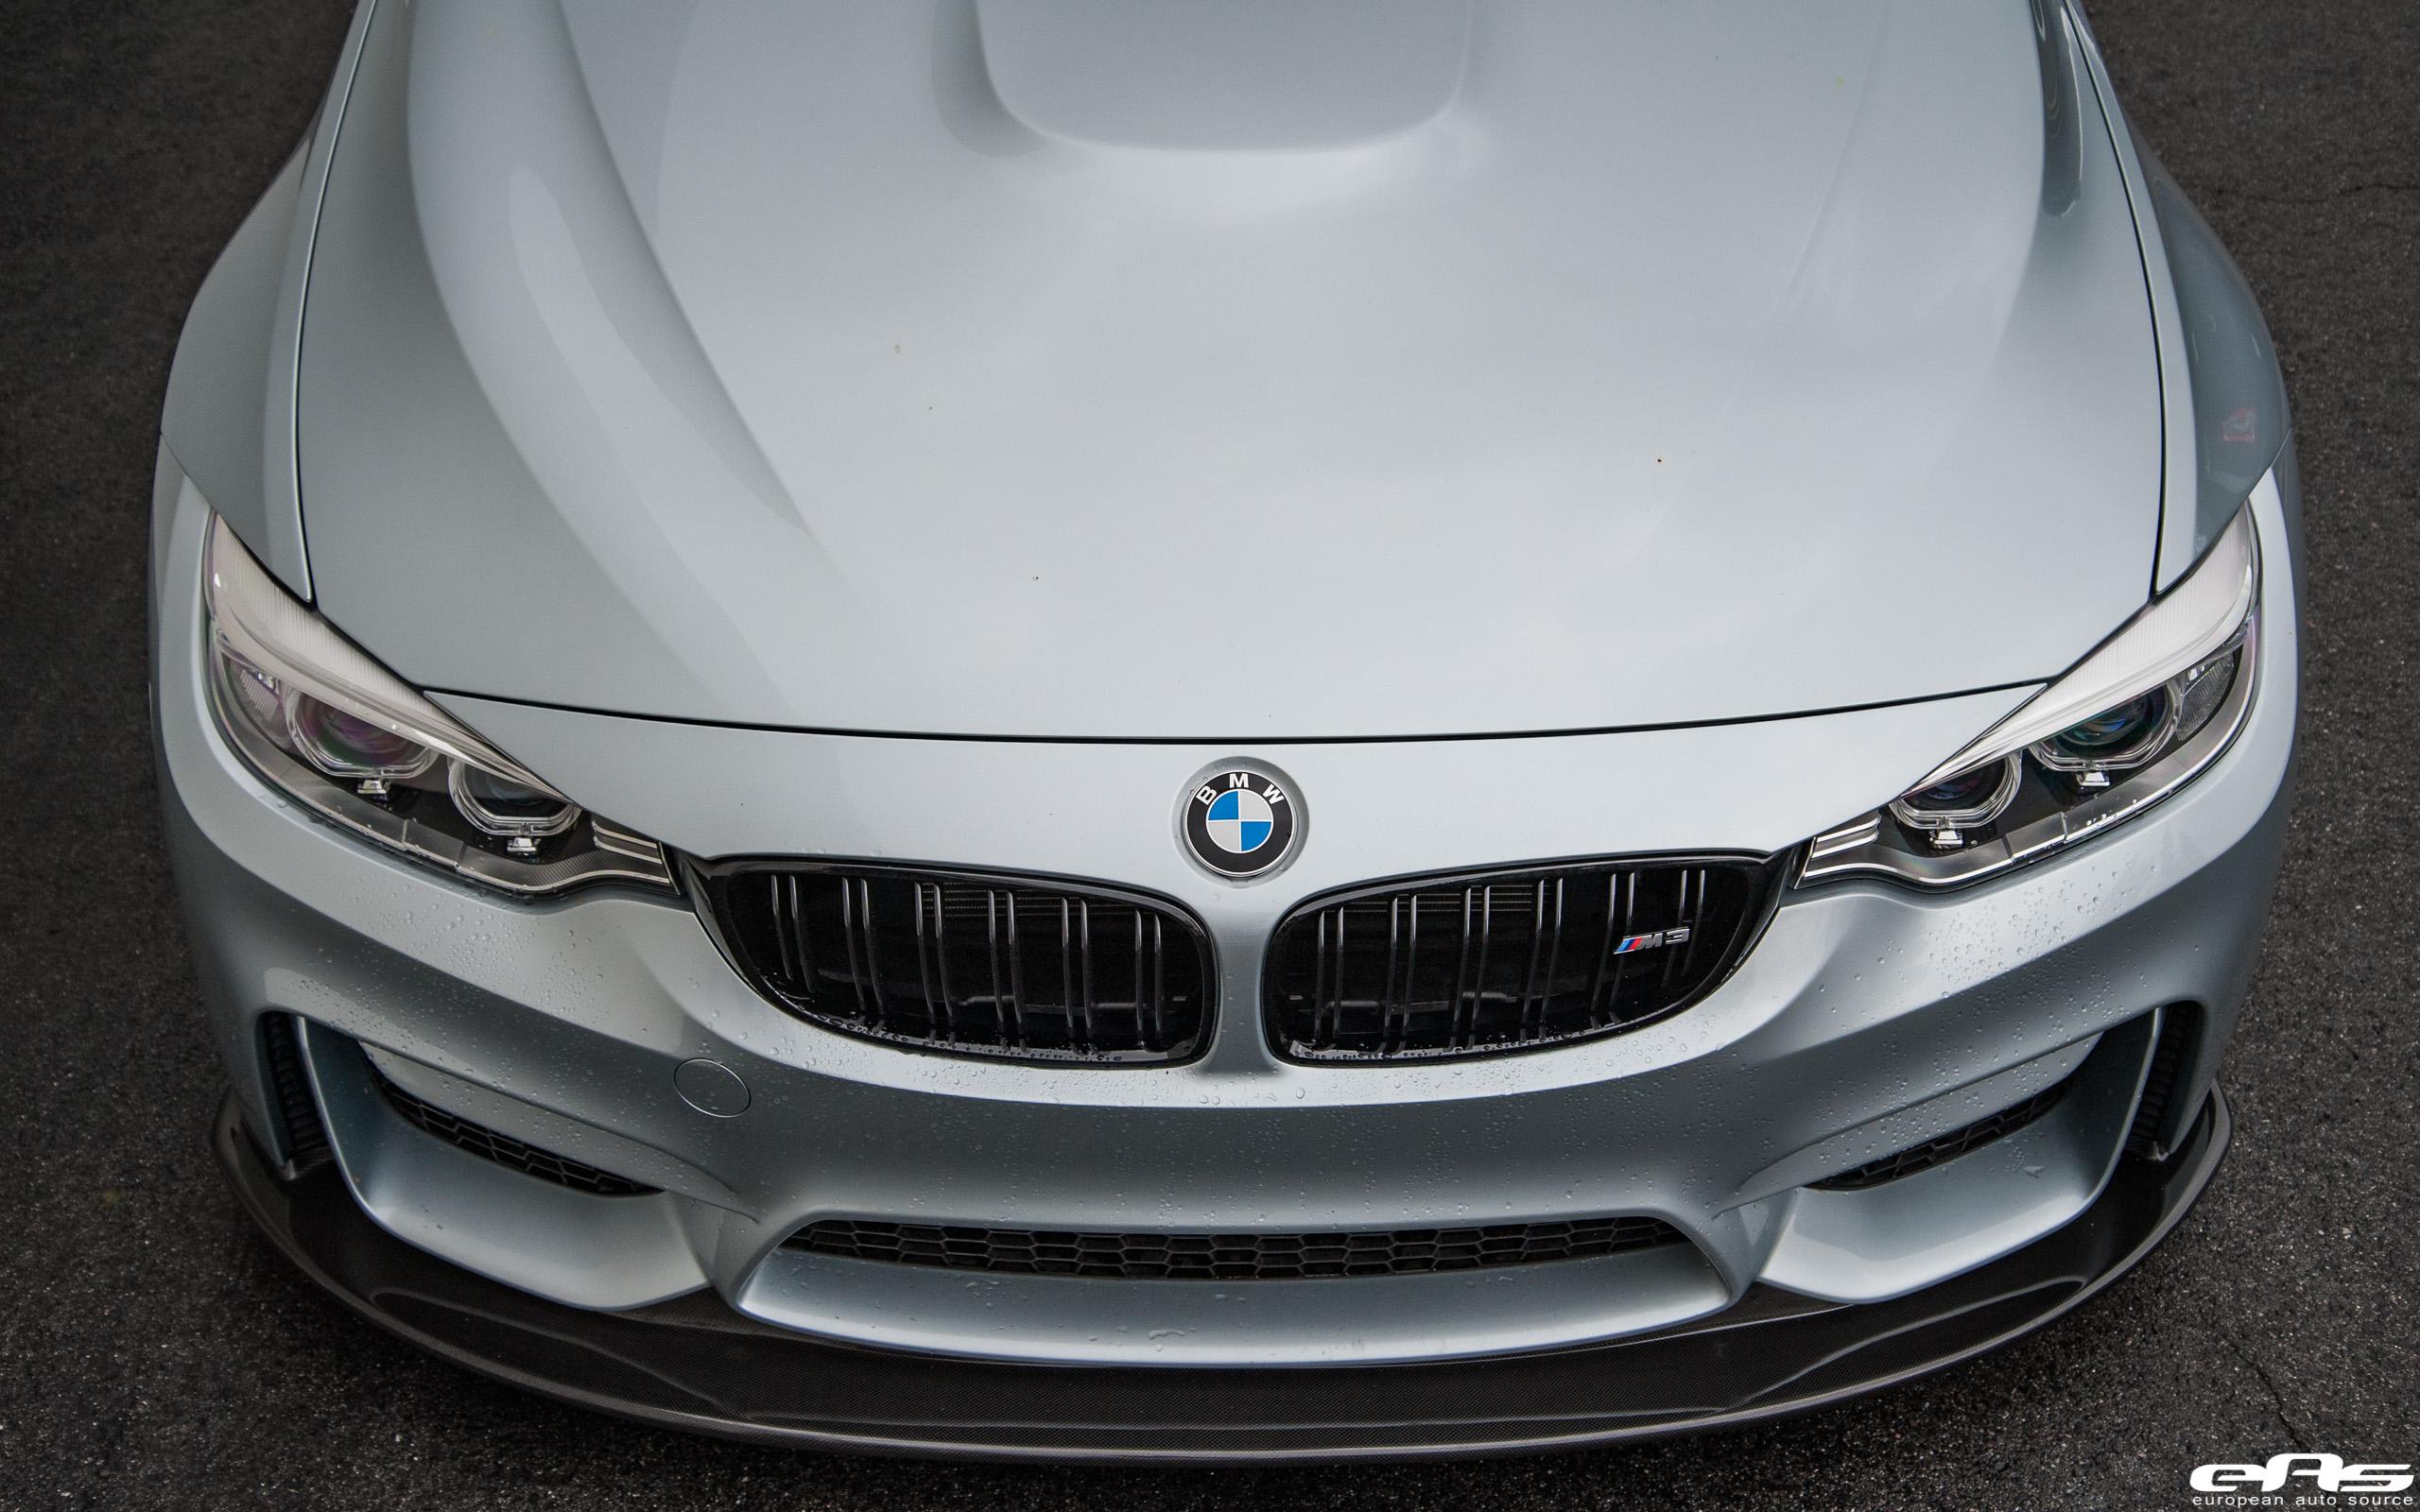 Silverstone Metallic BMW M3 Build By European Auto Source Images 11